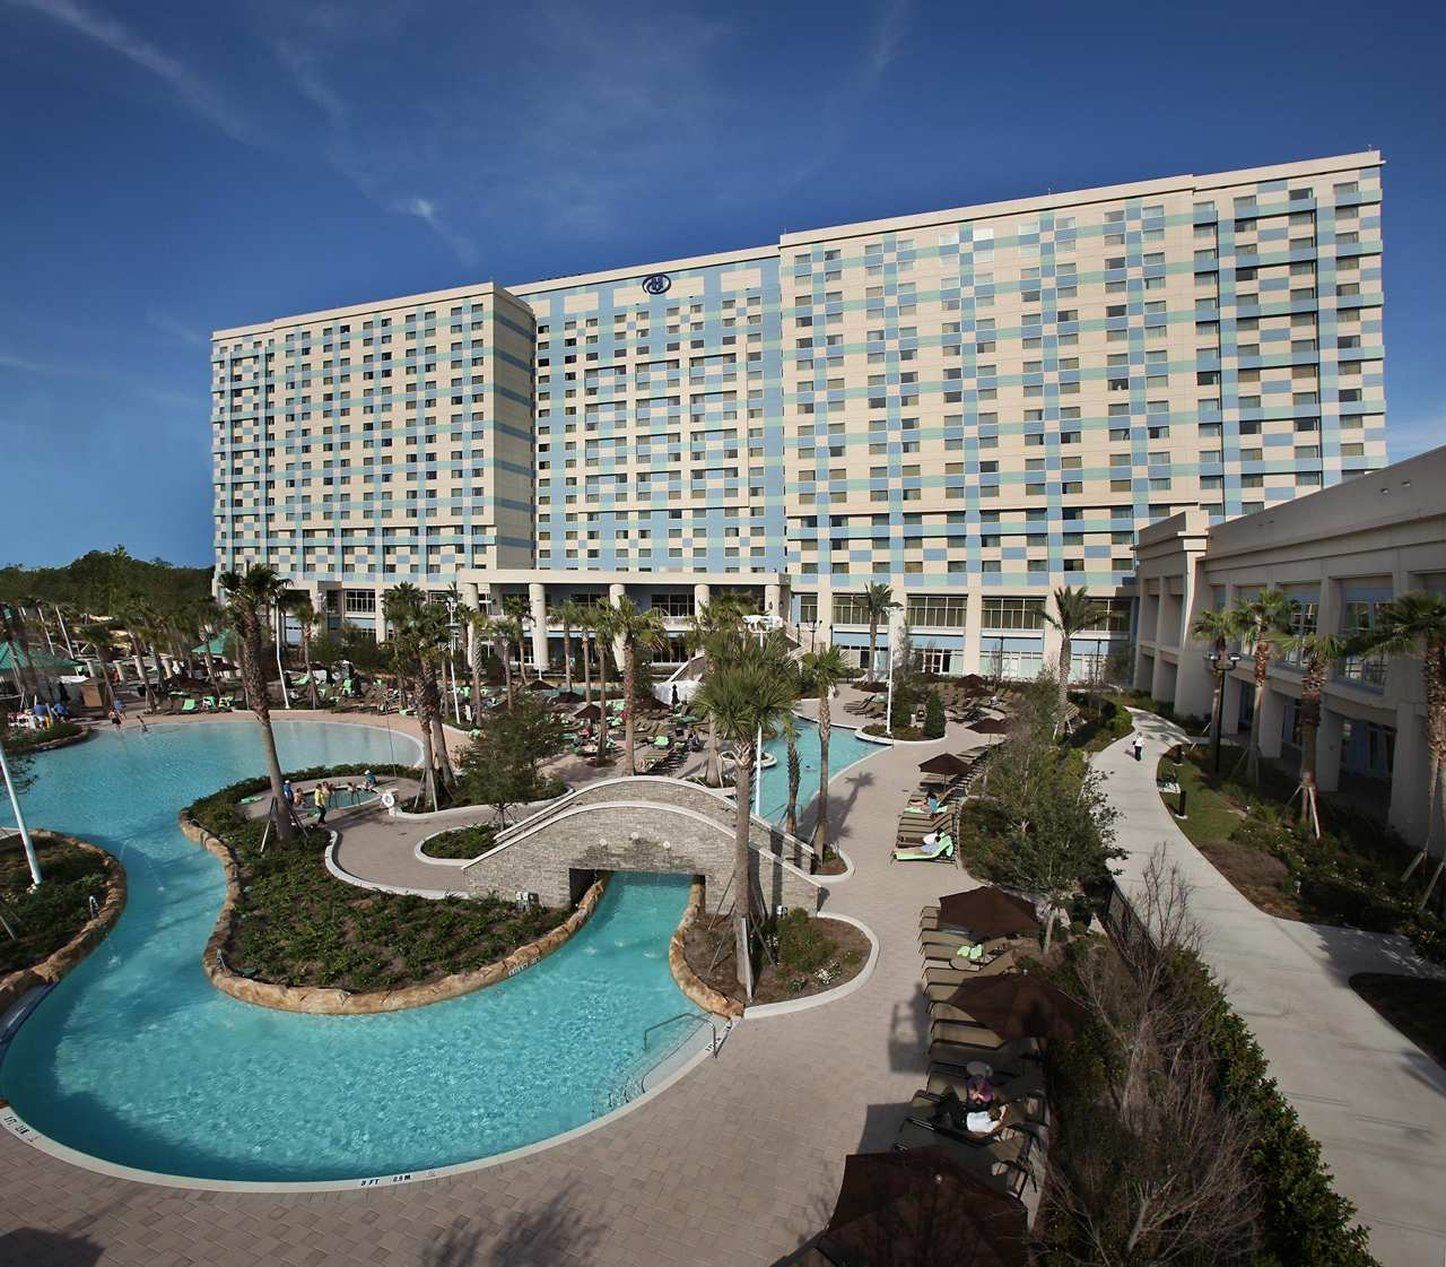 Book Hilton Orlando Bonnet Creek On Tripadvisor See 5 116 Traveler Reviews 1 703